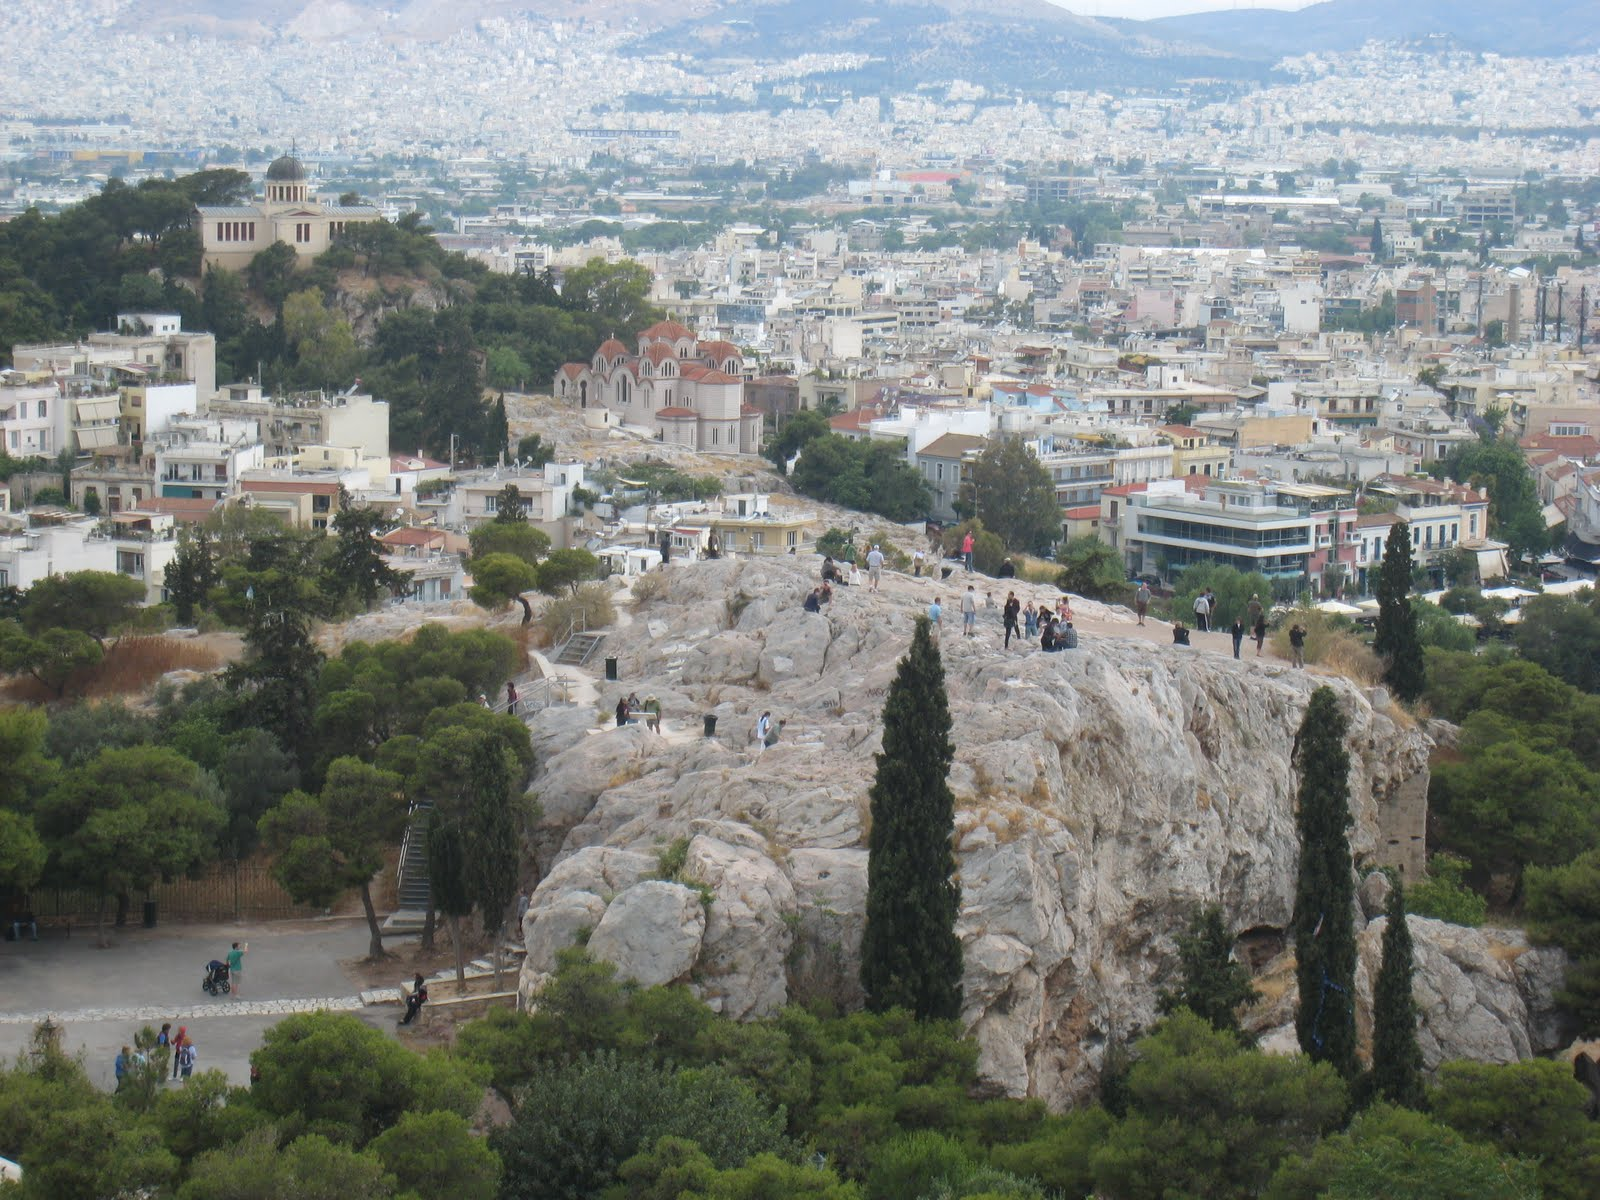 aegean antics: Athens-Areopagus